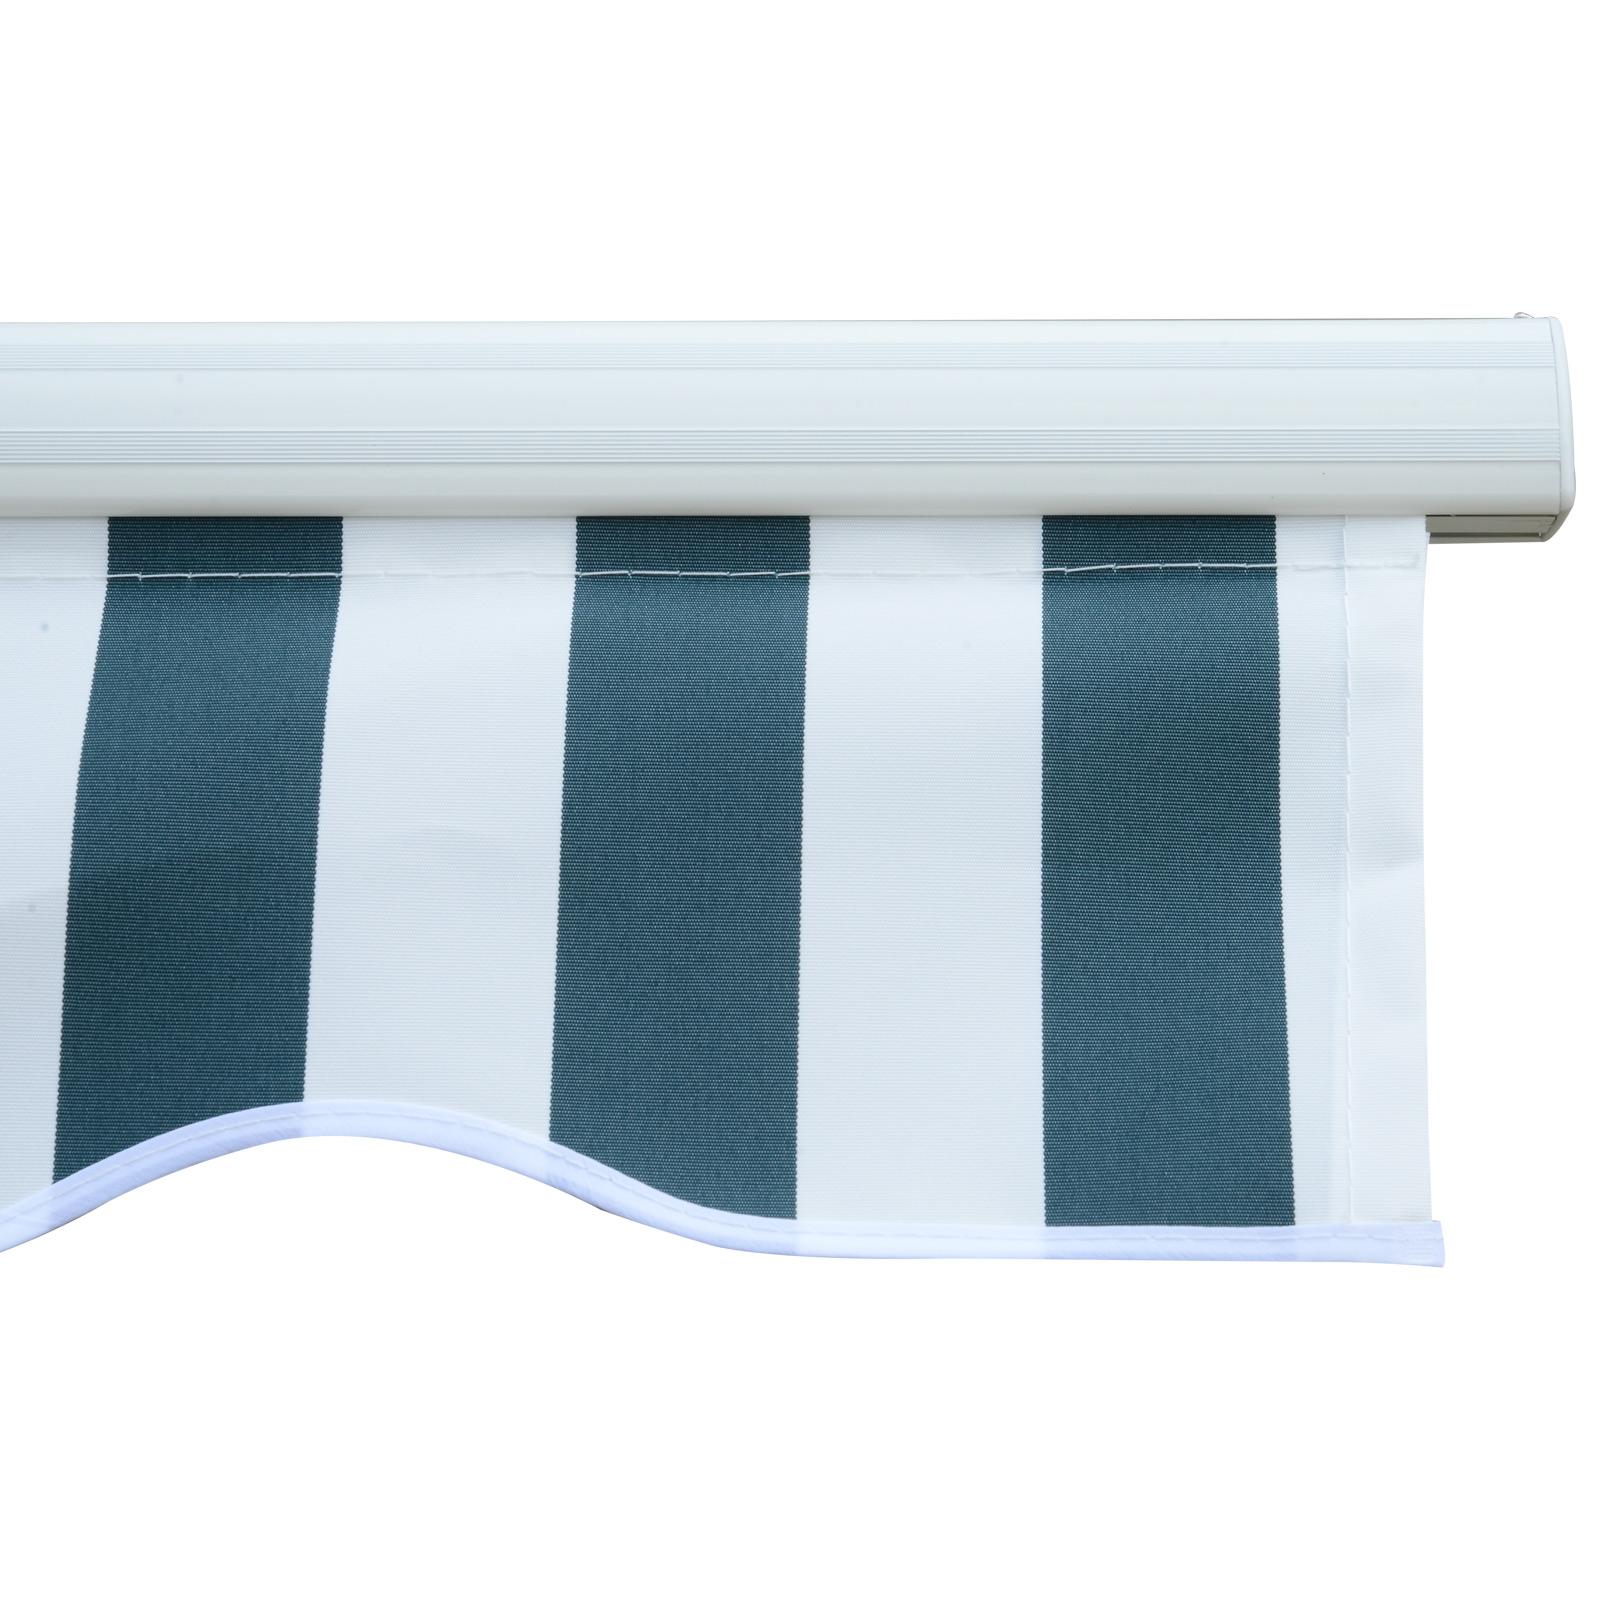 Garden-Patio-Manual-Awning-Canopy-Sun-Shade-Shelter-Retractable-4-Size-5-Colour thumbnail 29